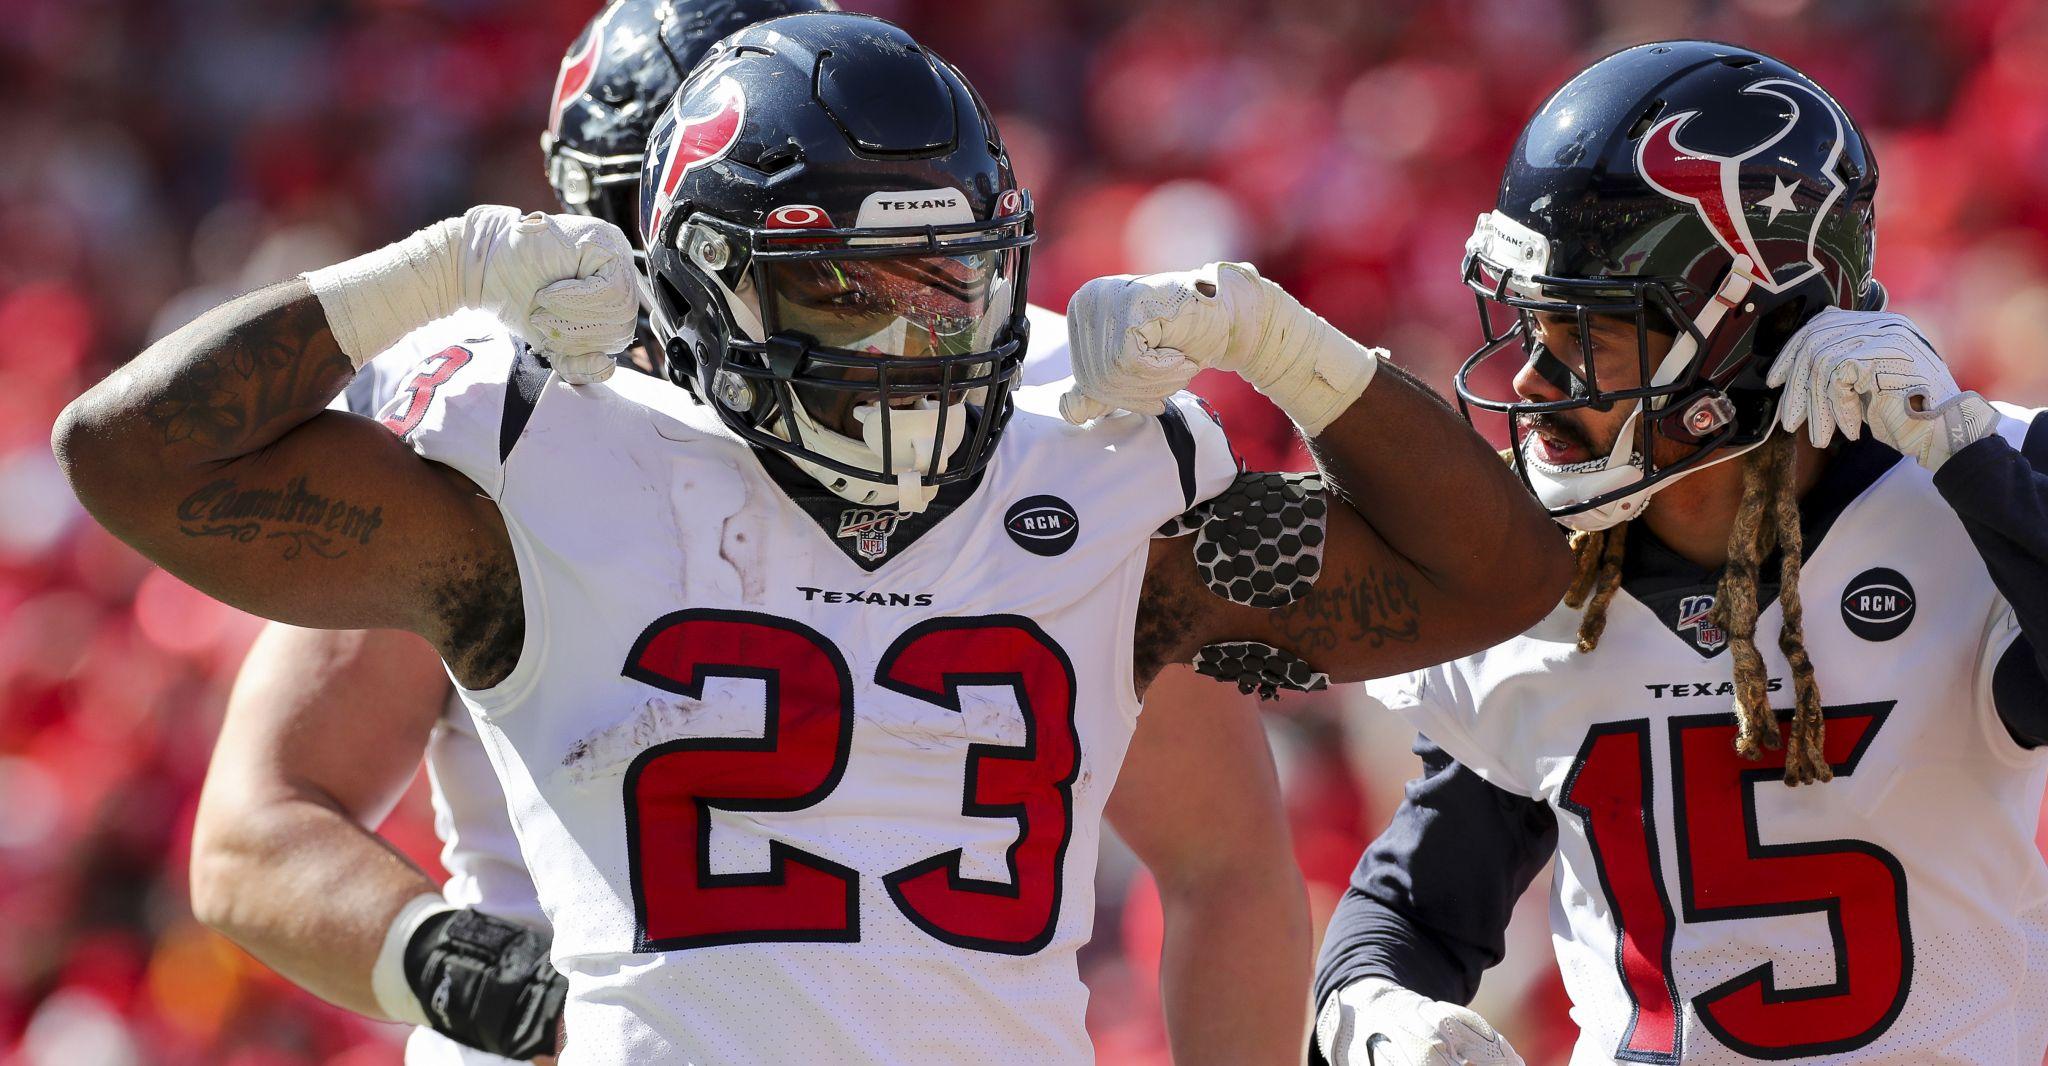 Texans-Chiefs rewind: 5 up, 5 down